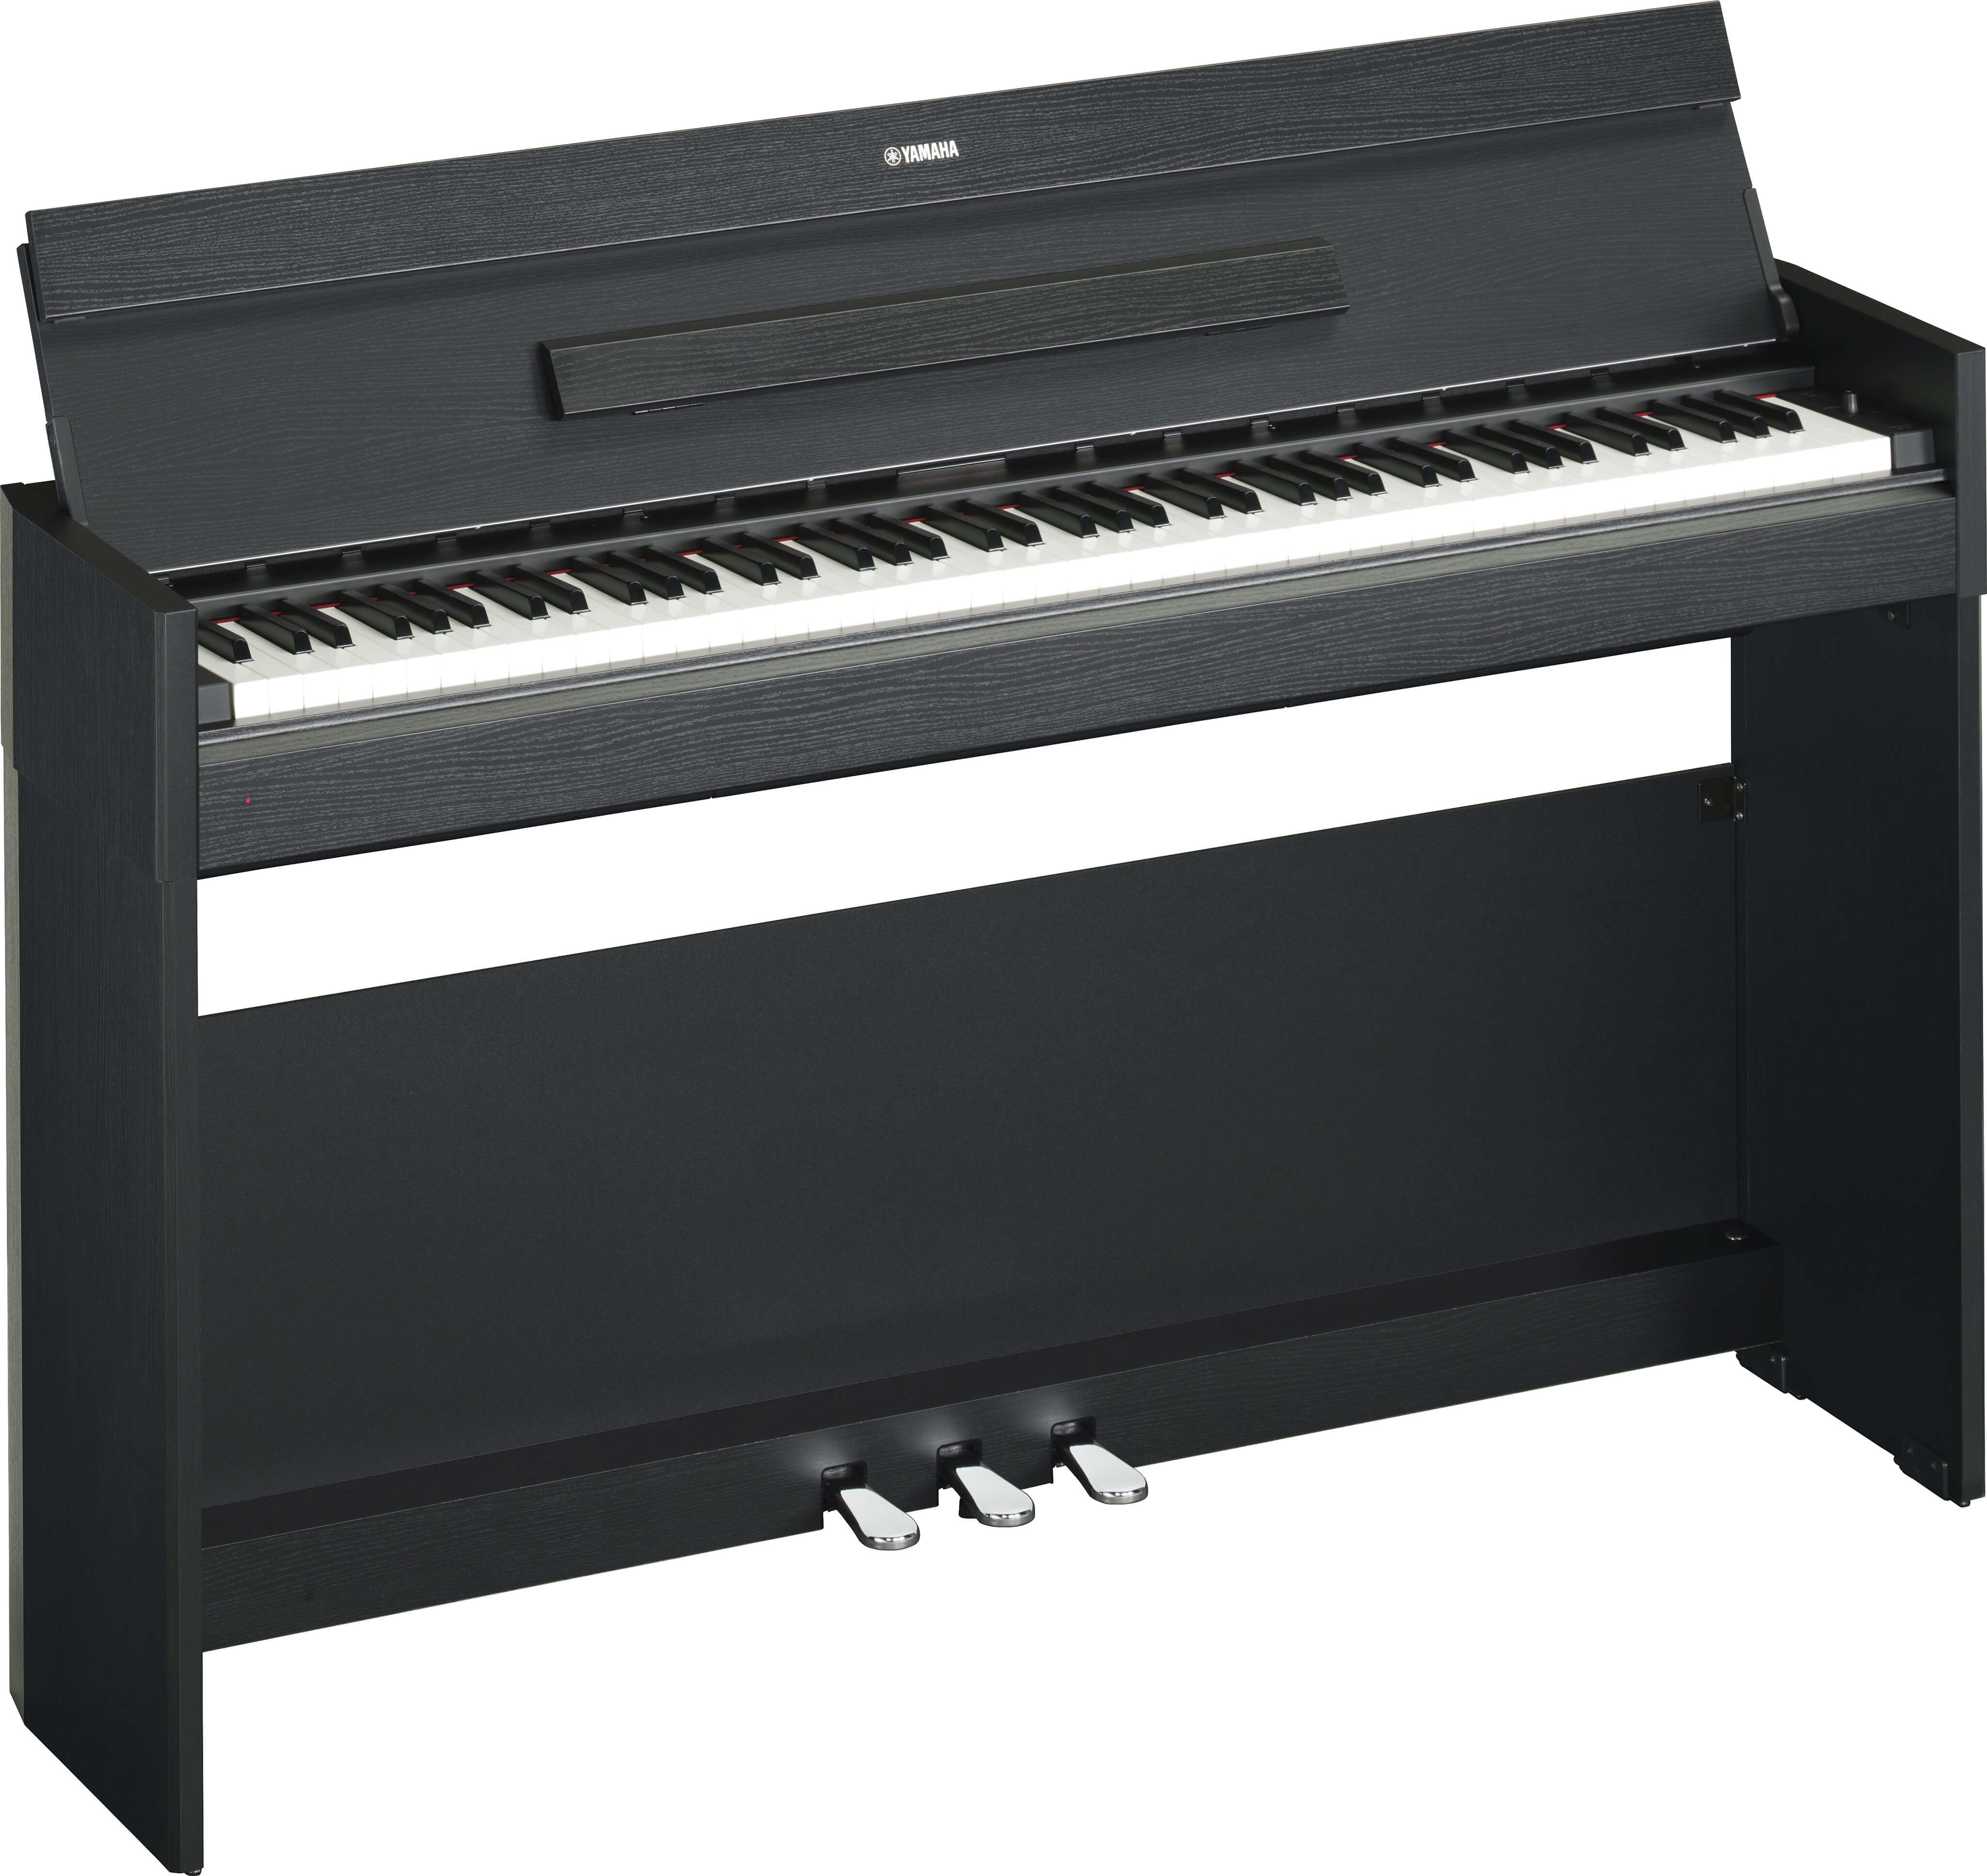 Piano Digital Yamaha YDP-S52